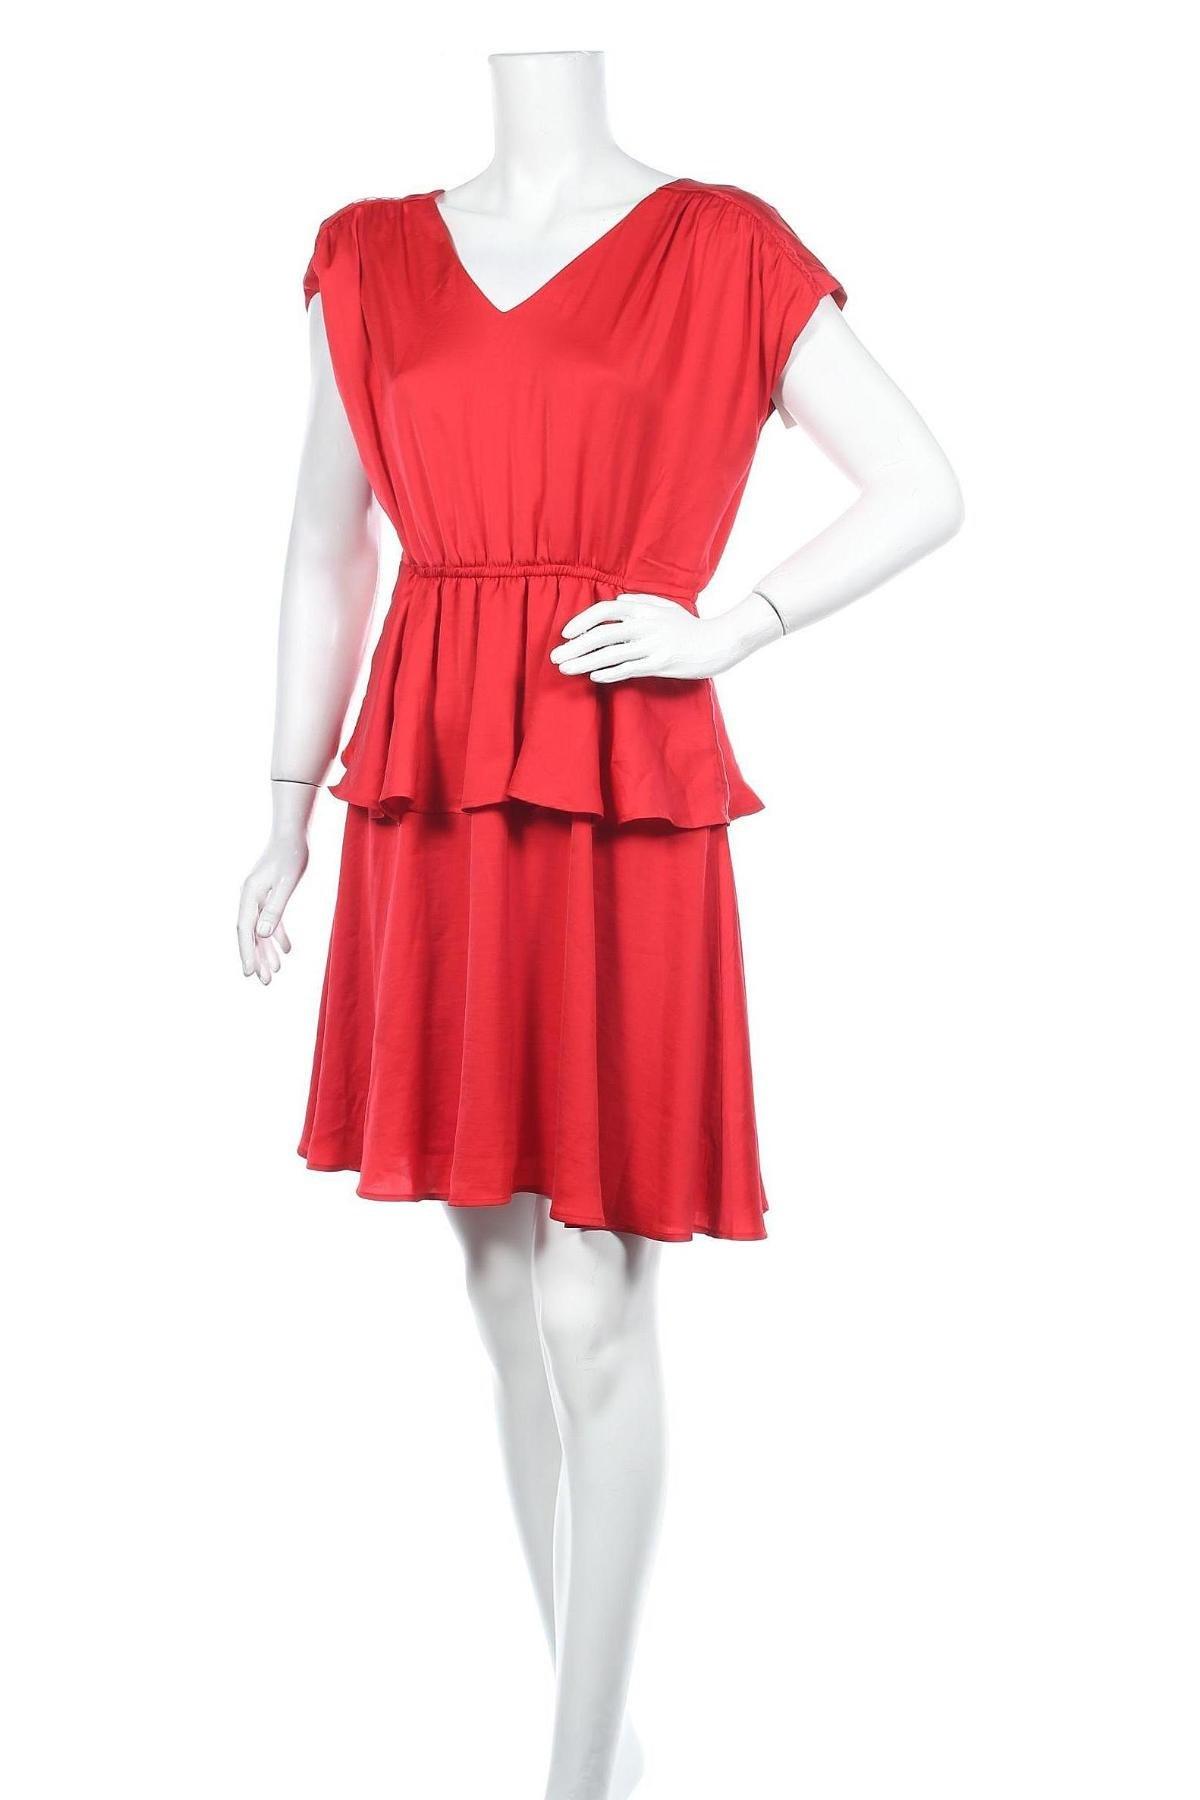 Рокля Modstrom, Размер S, Цвят Червен, Полиестер, Цена 96,75лв.